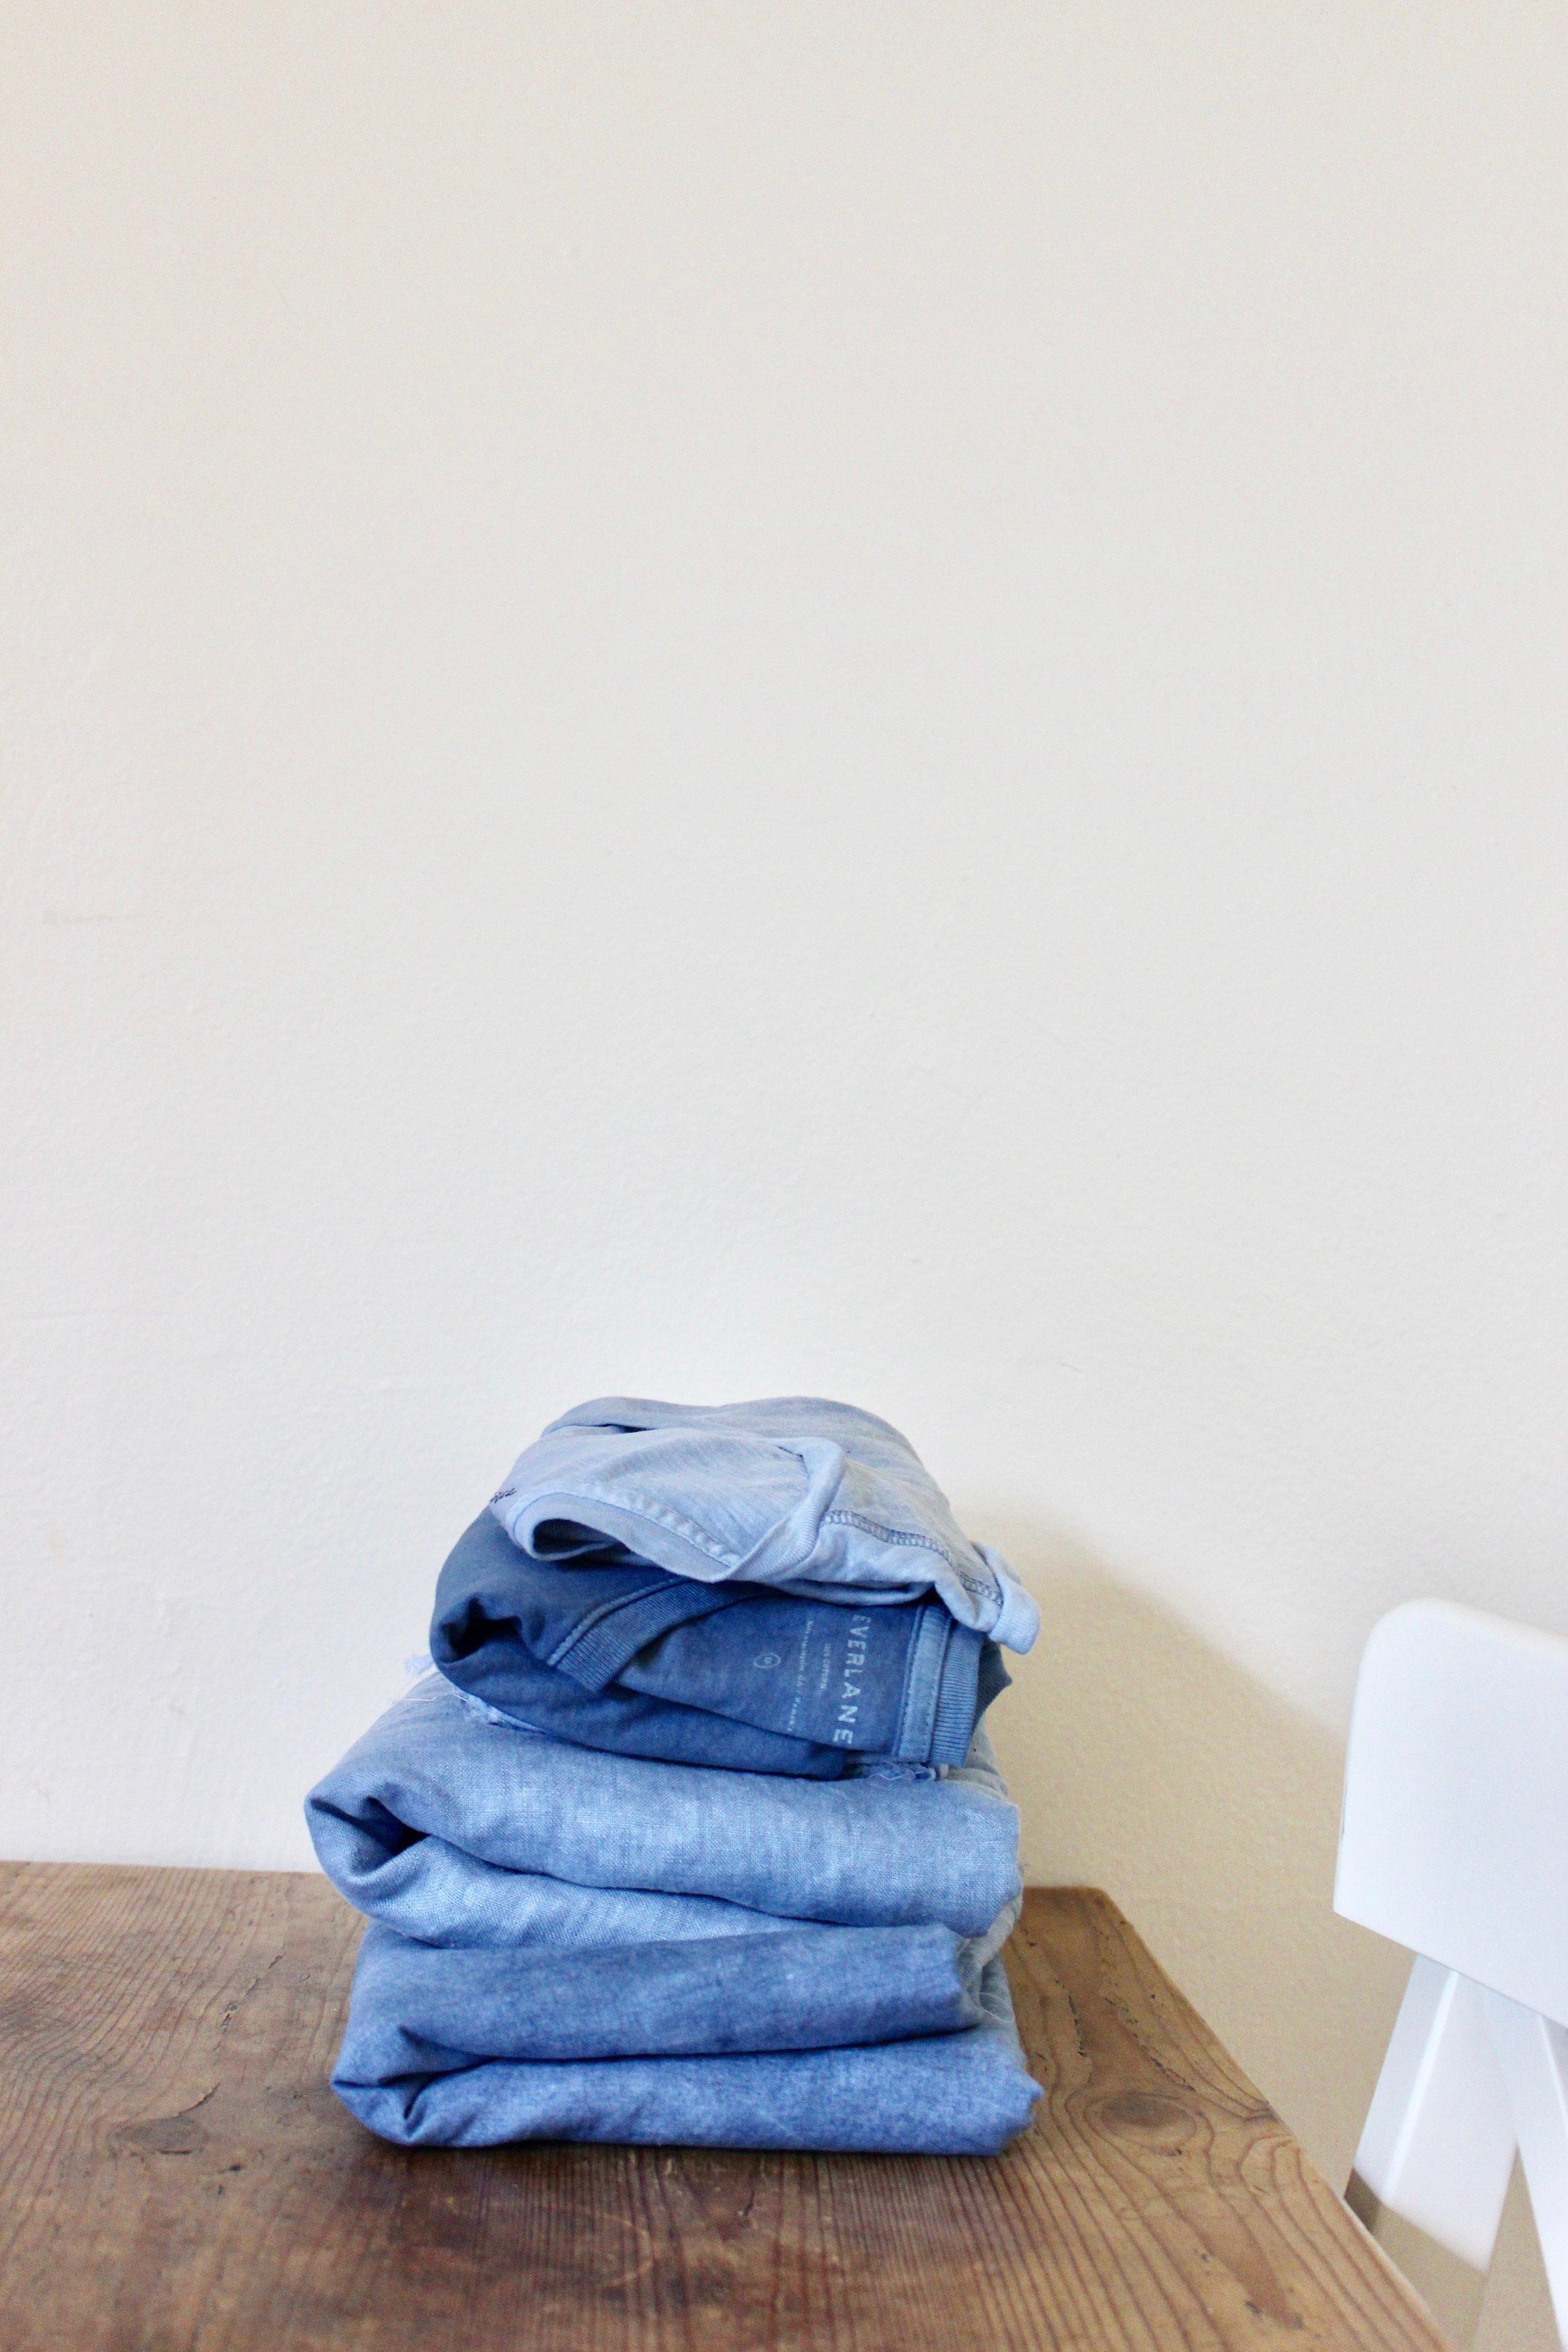 How to indigo dye clothing | Litterless